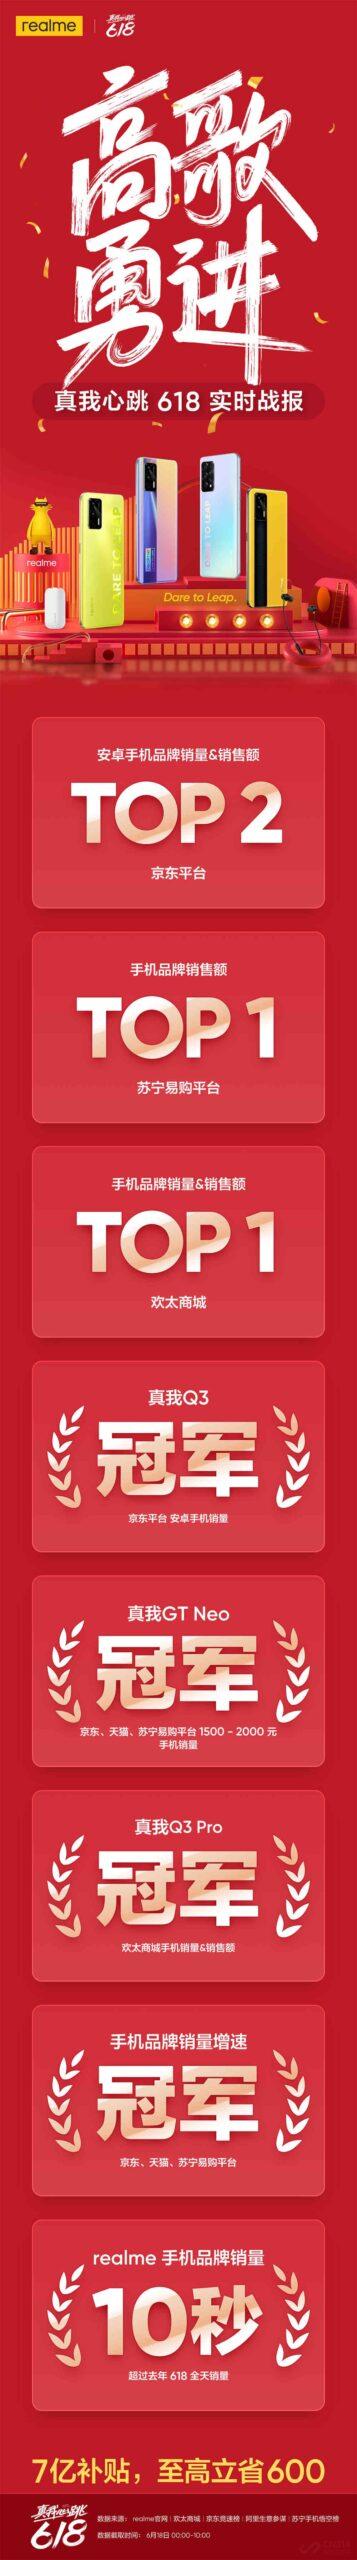 618 realme高歌勇进 拿下多榜单多个TOP1